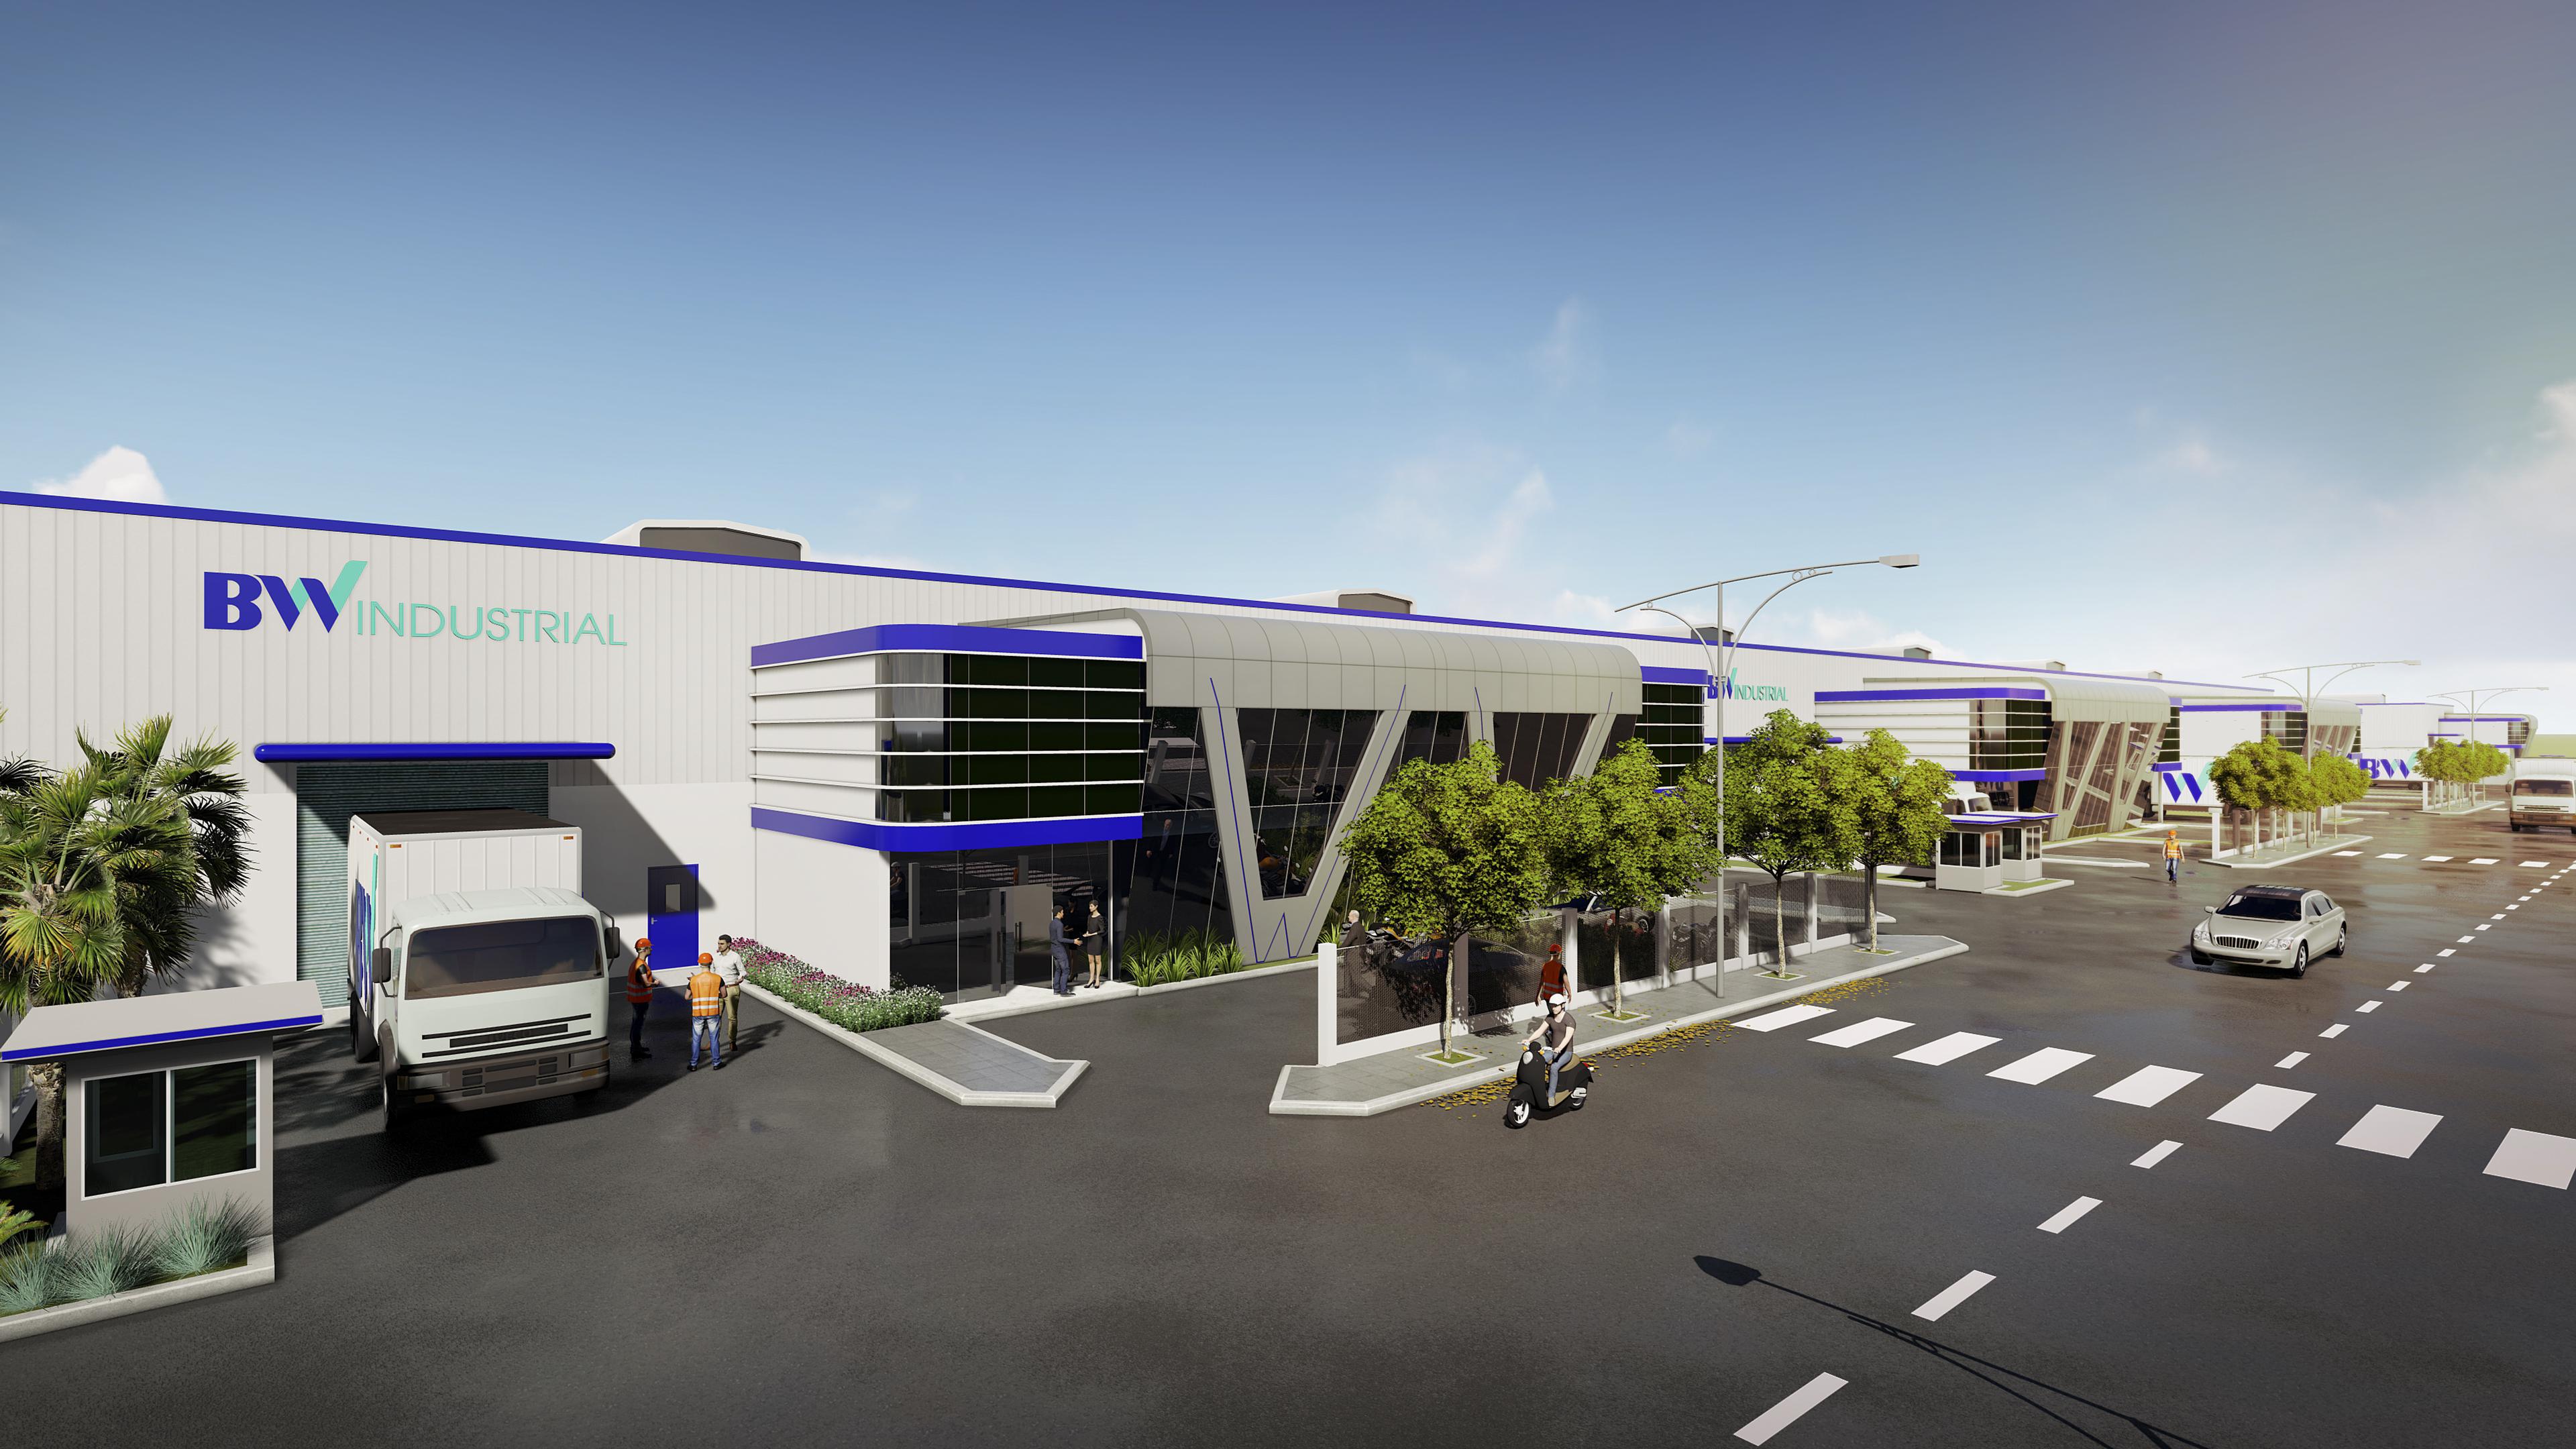 Premium Factory For Rent in VSIP Hai Phong – BW Industrial Development JSC